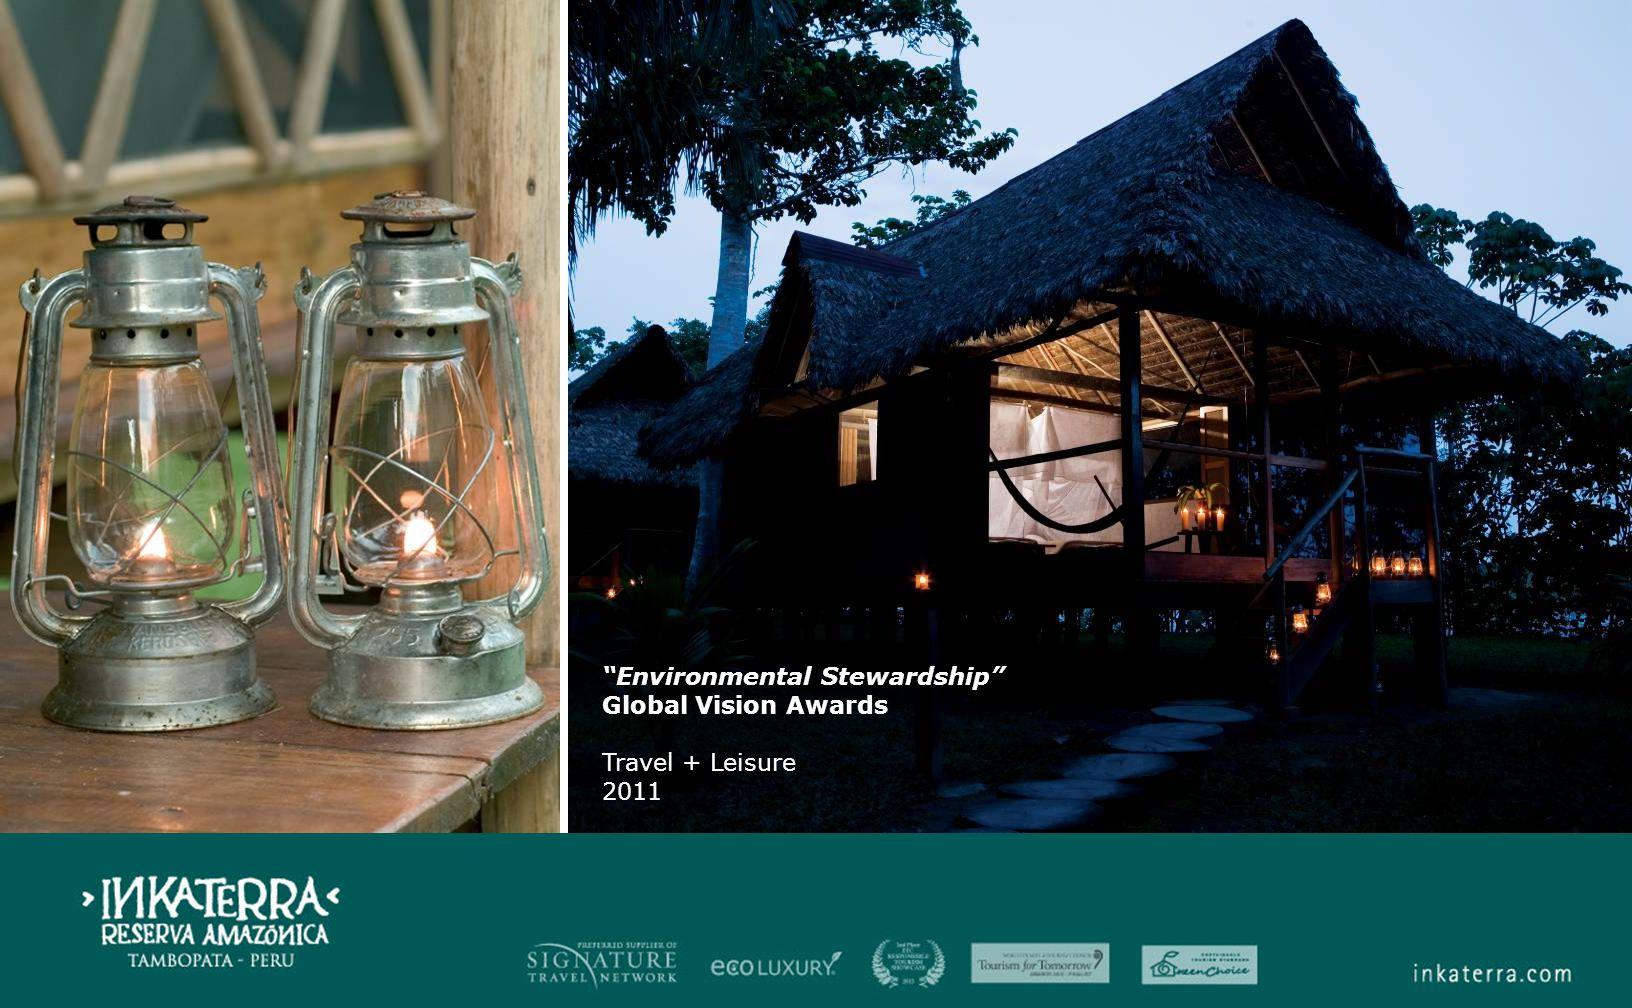 Environmental Stewardship Global Vision Awards Travel + Leisure 2011